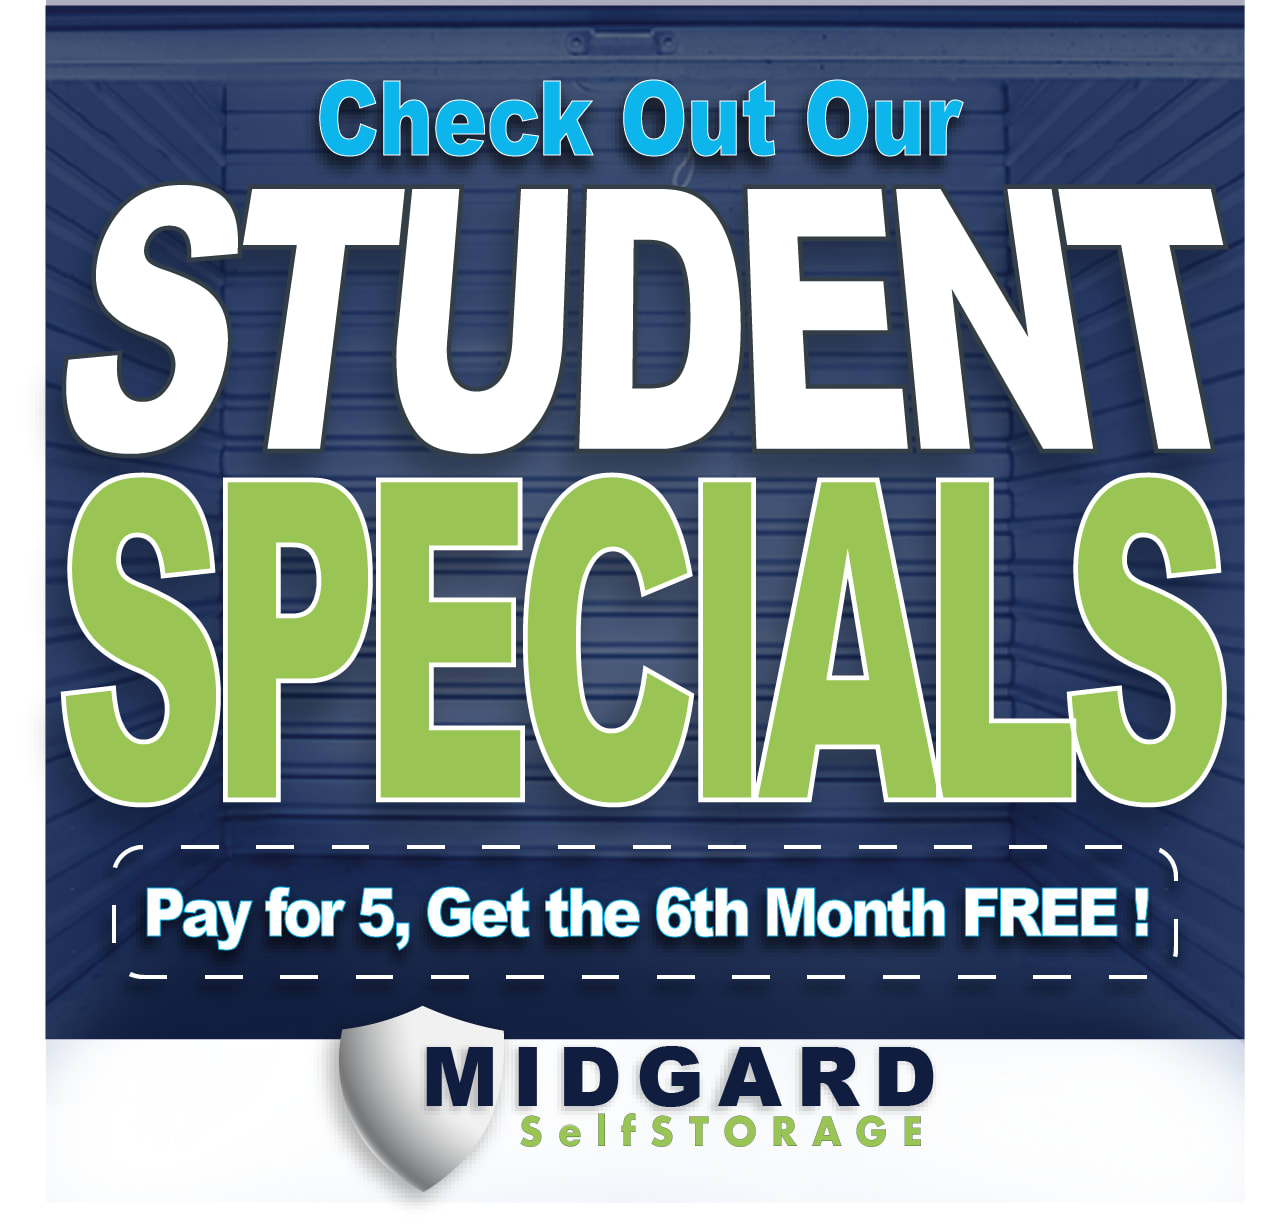 Specials offer